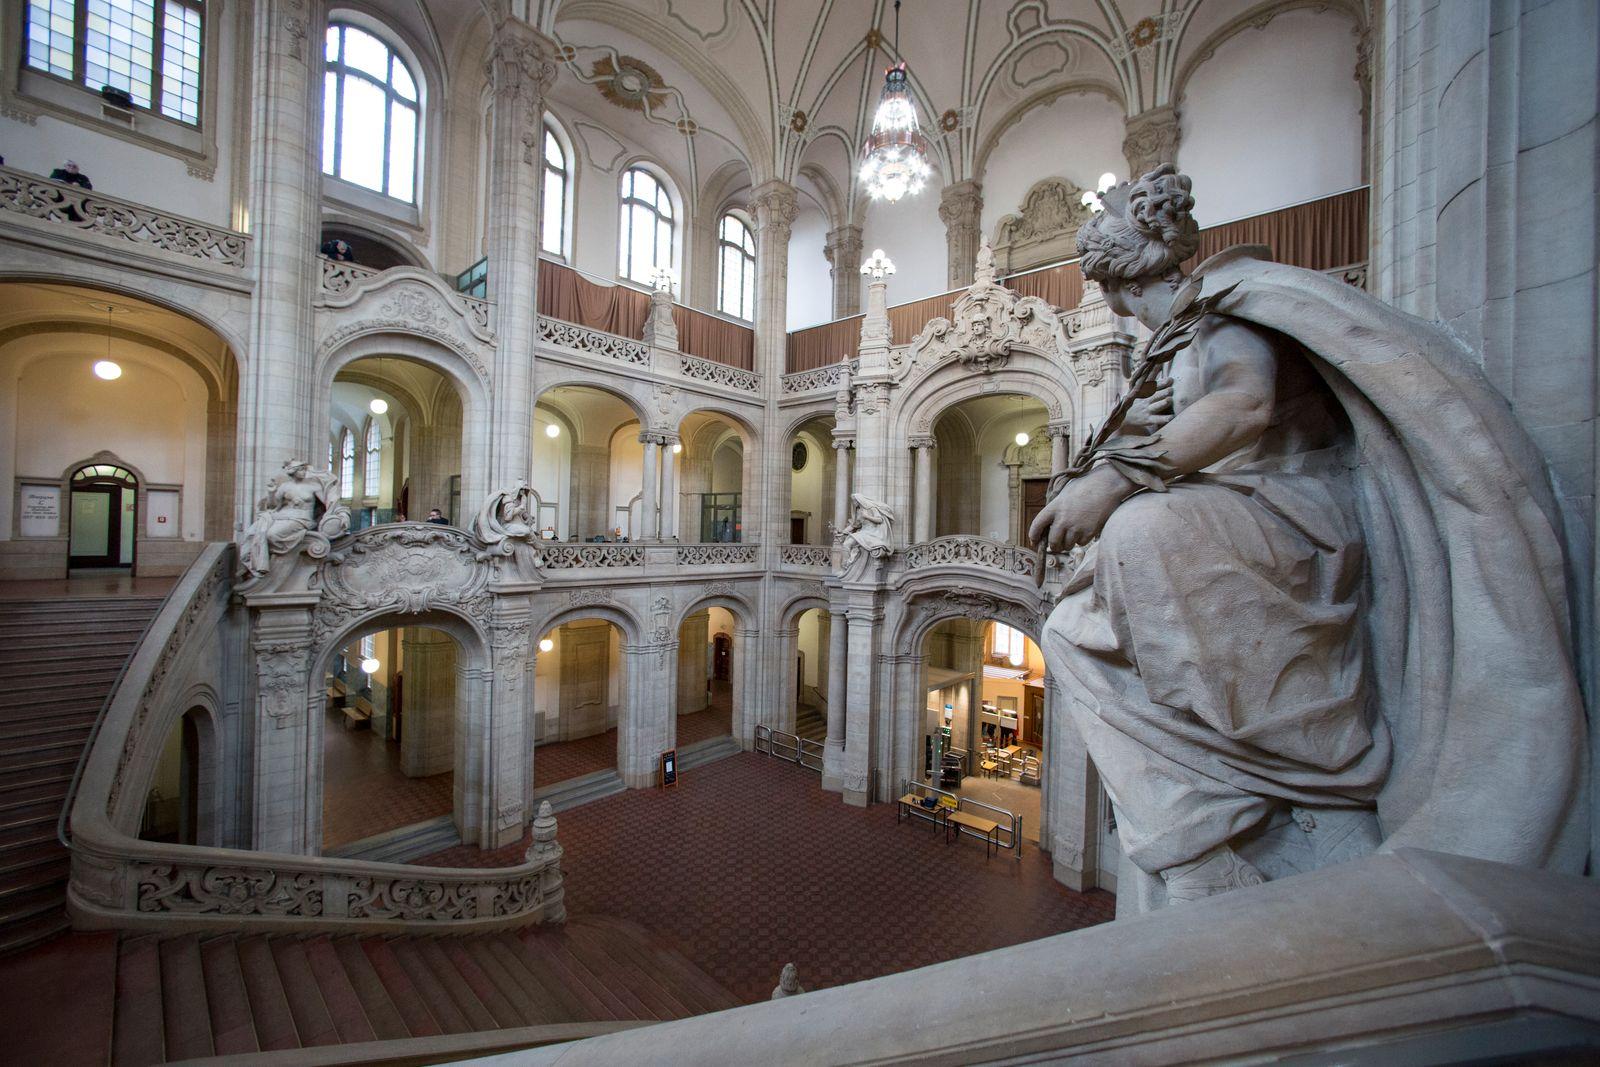 Entrance hall of the criminal court Berlin-Moabit.